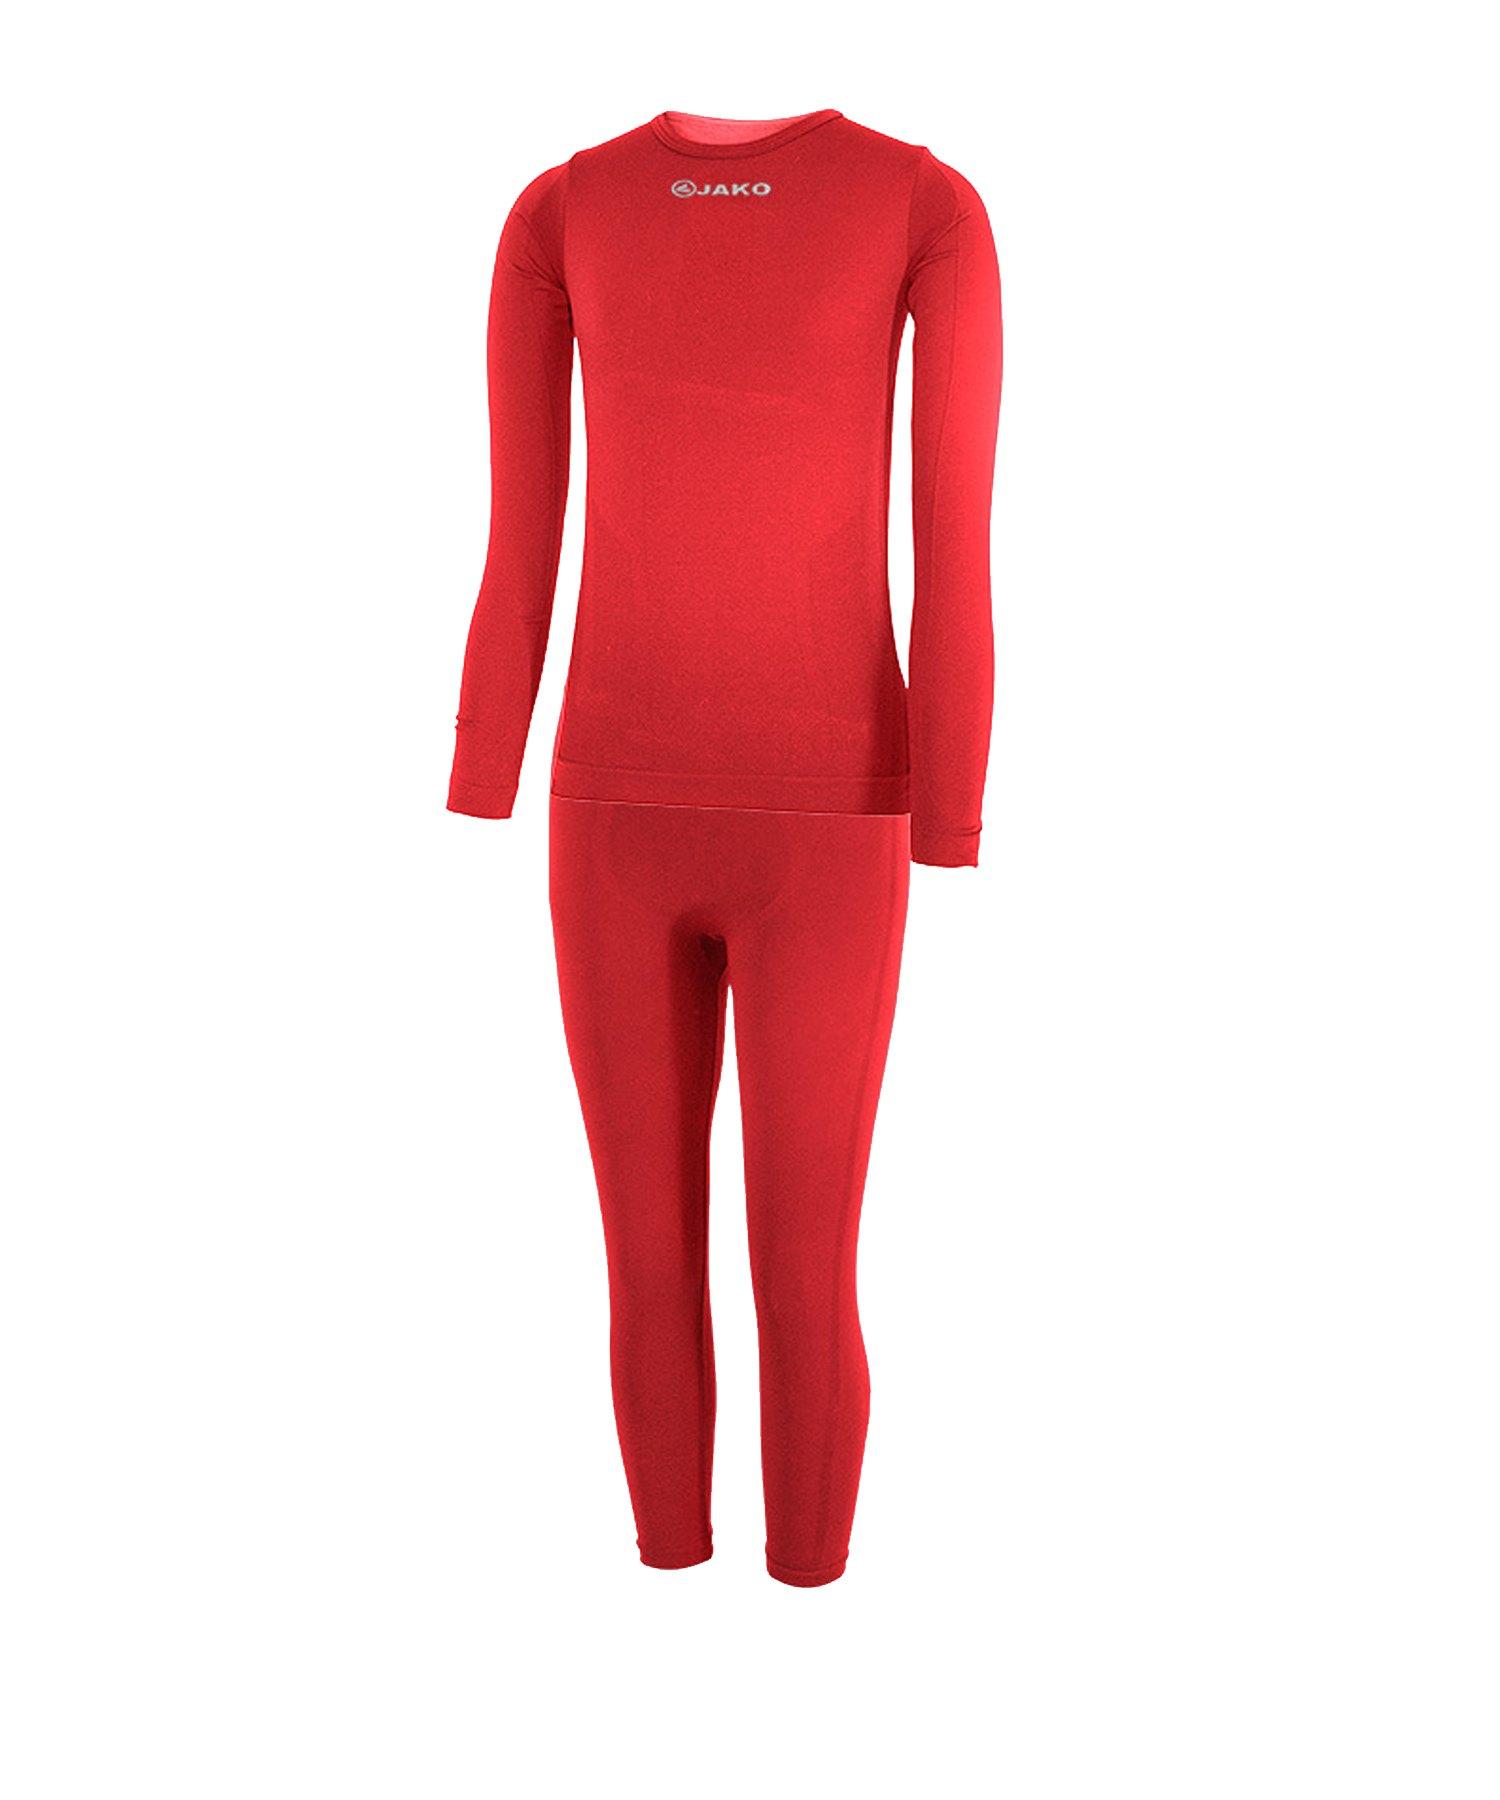 Jako Underwear Kinderset Rot F01 - rot